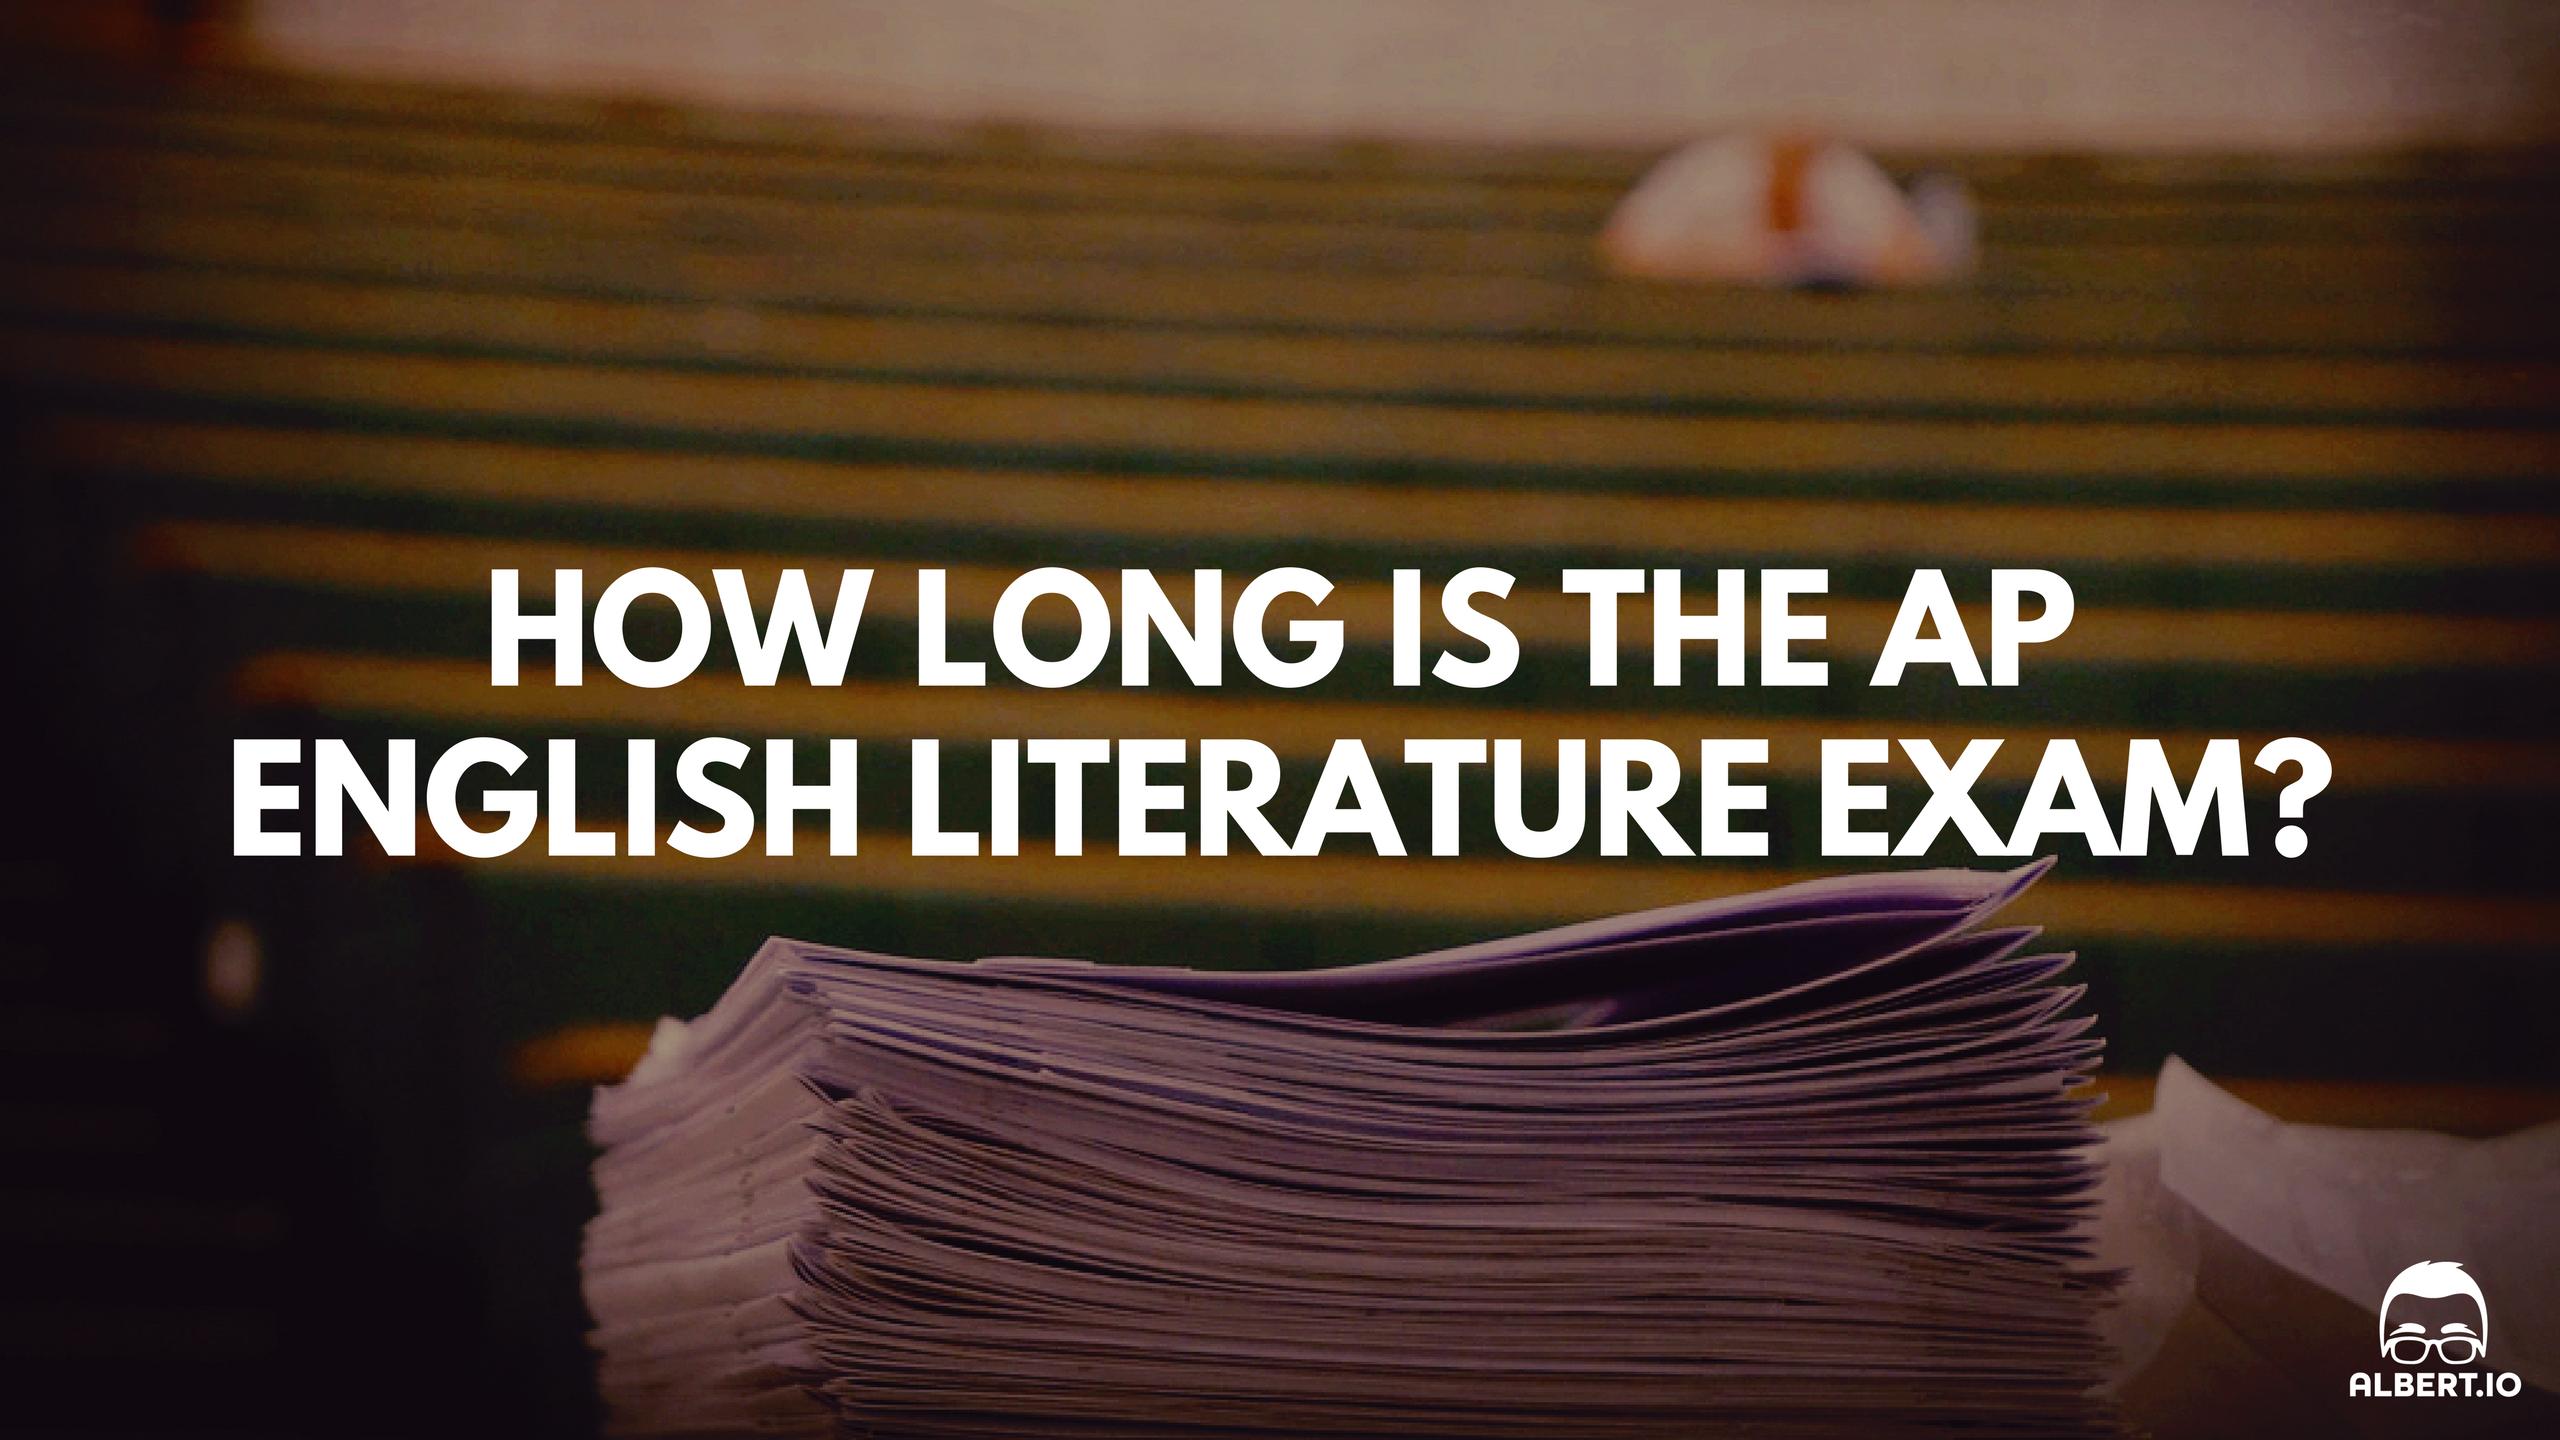 types of essays on the ap english literature exam